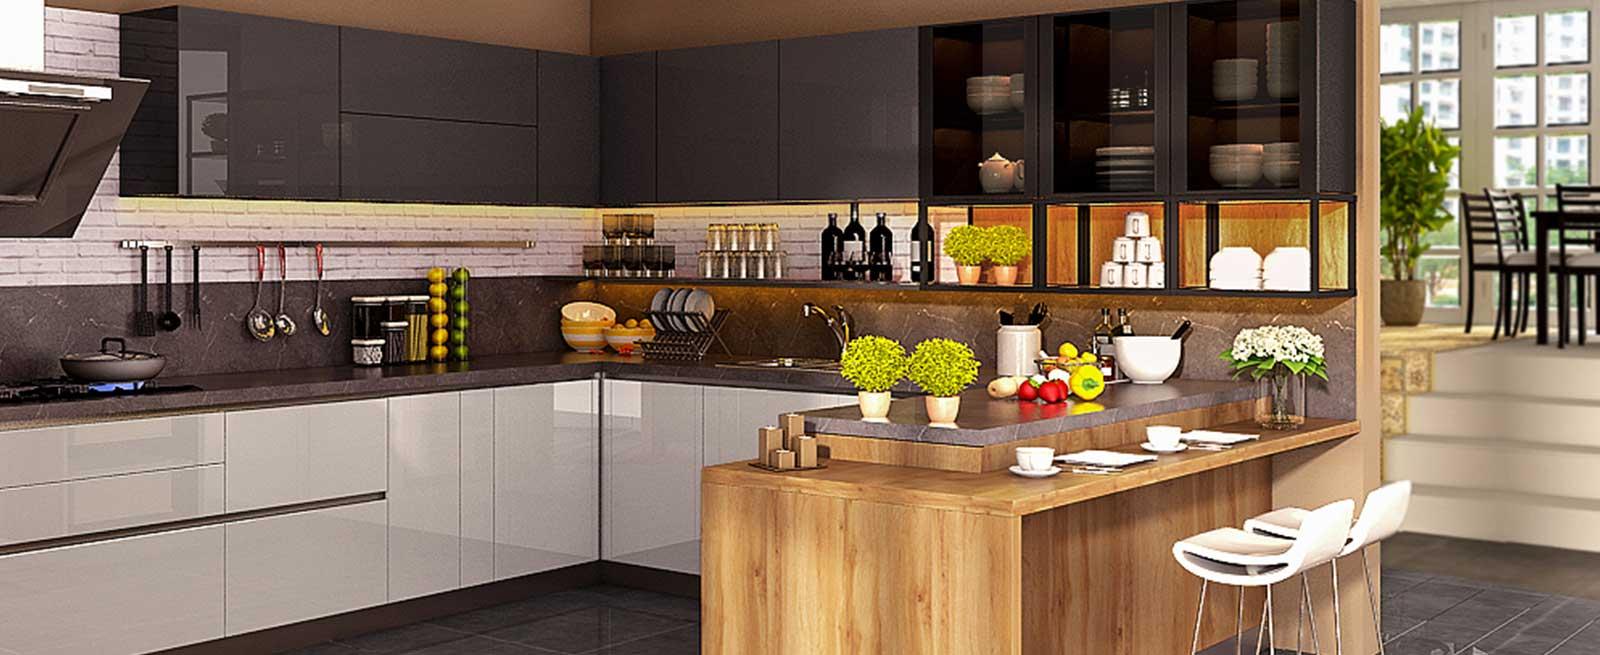 Modular Design Kitchen in Mumbai – Gravitymart.com